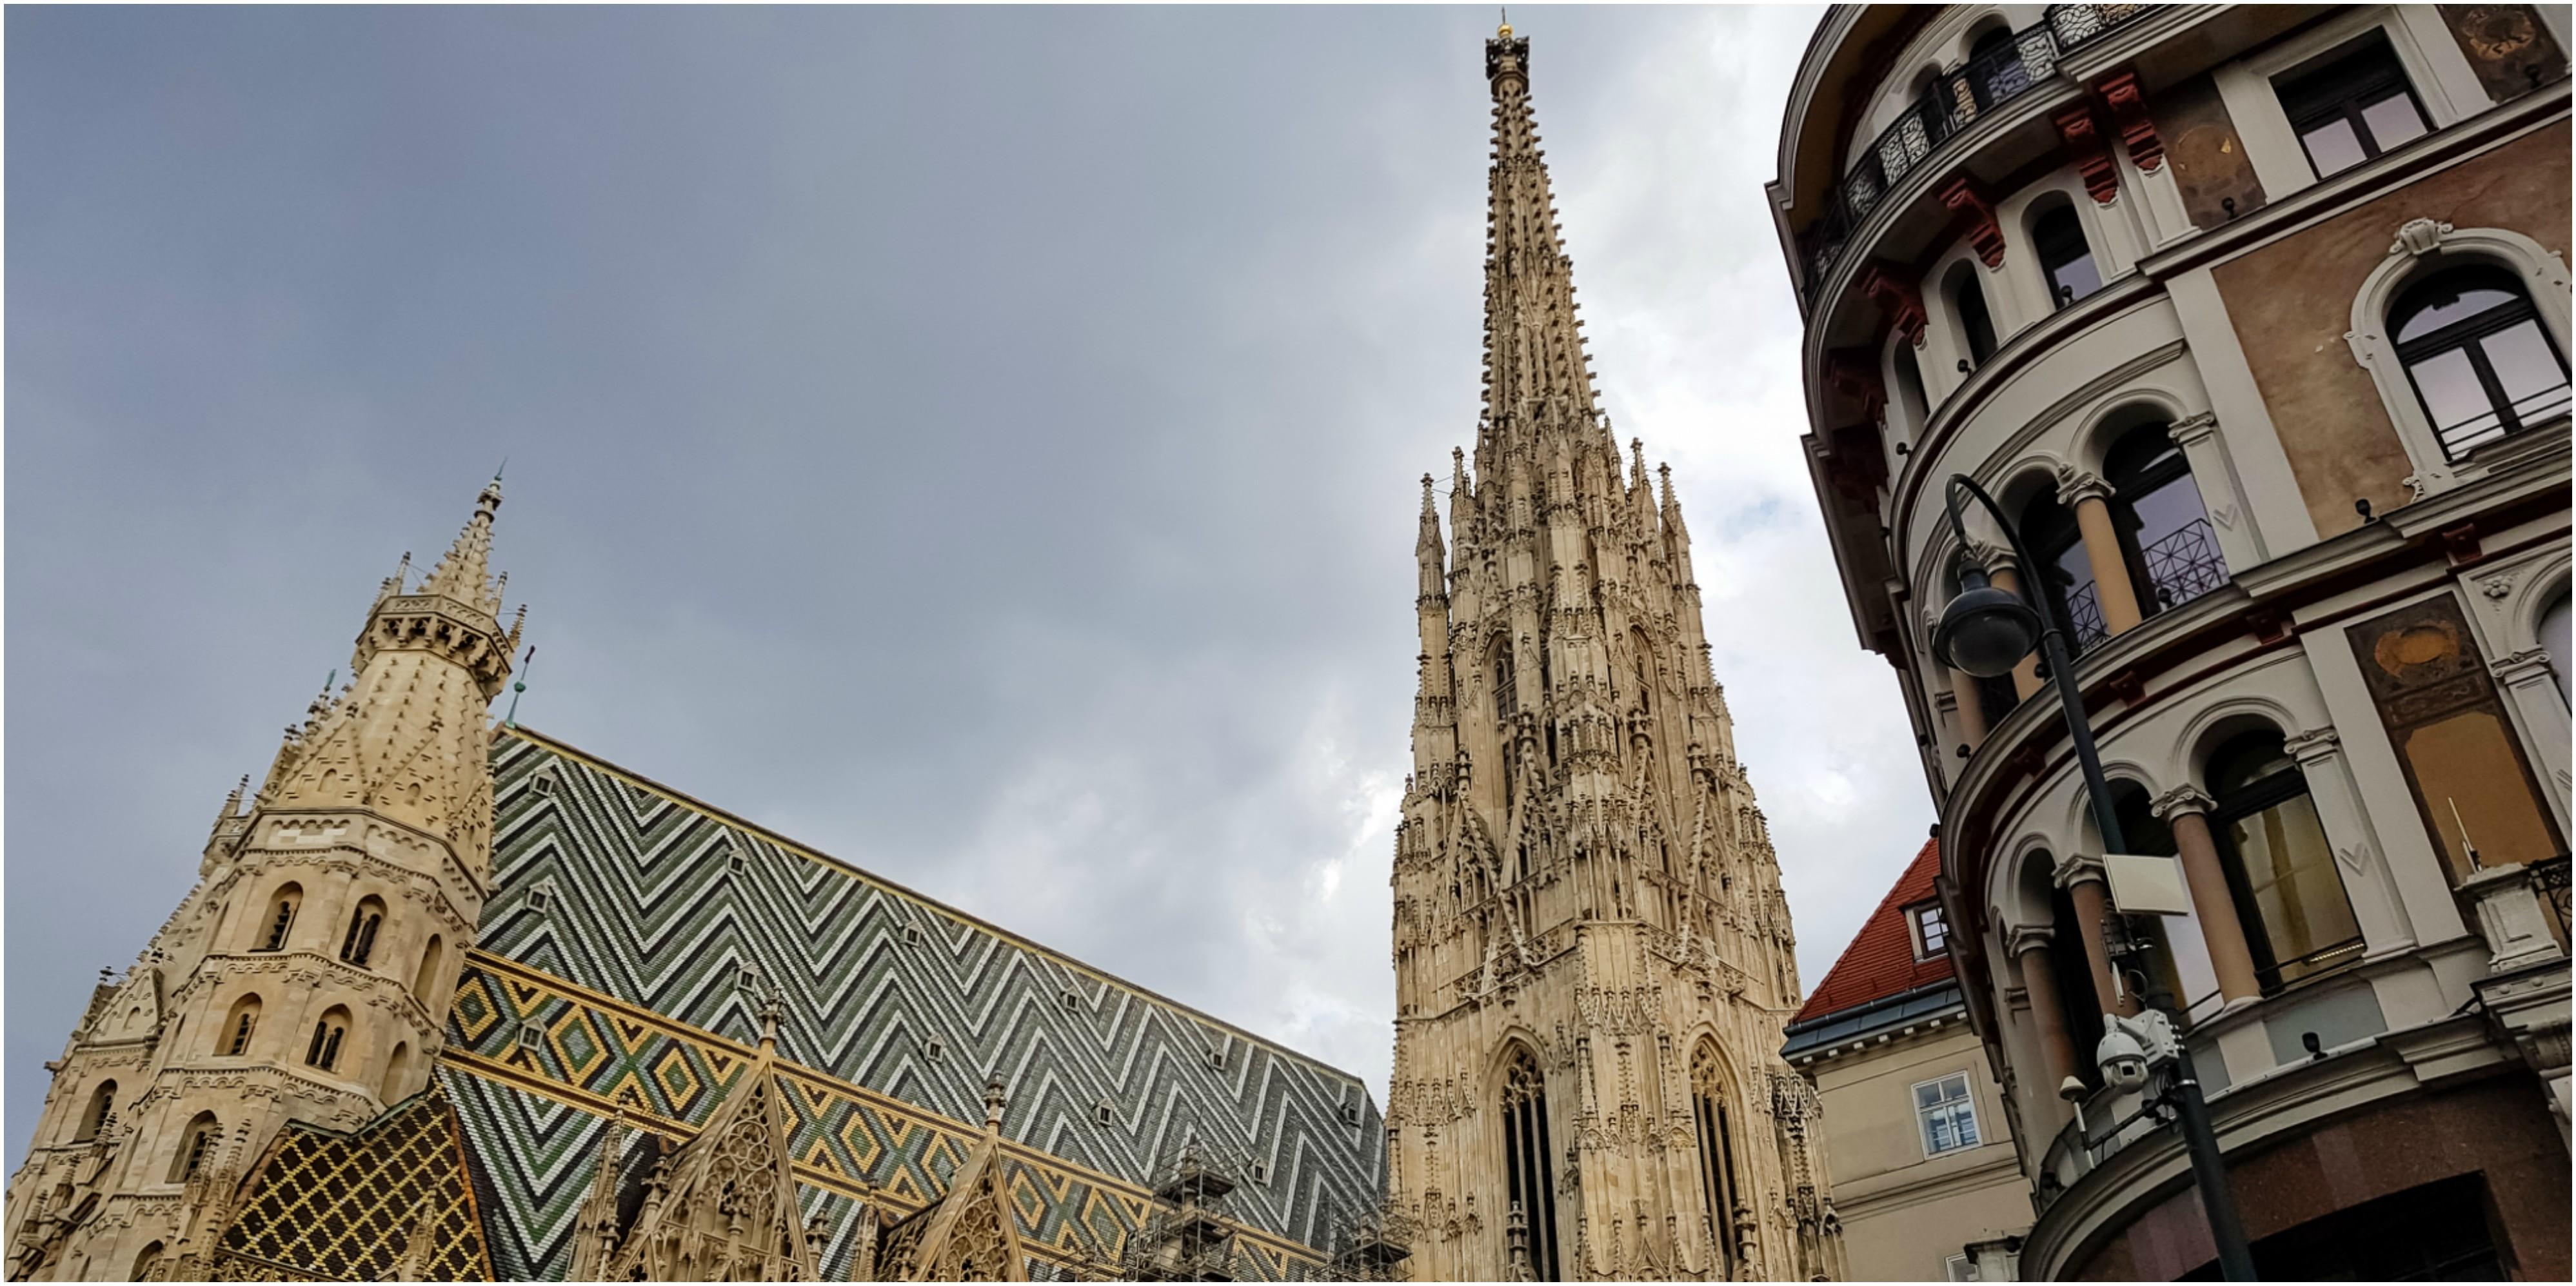 3-jours-Vienne-blog-voyage-cathédrale-saint-etienne